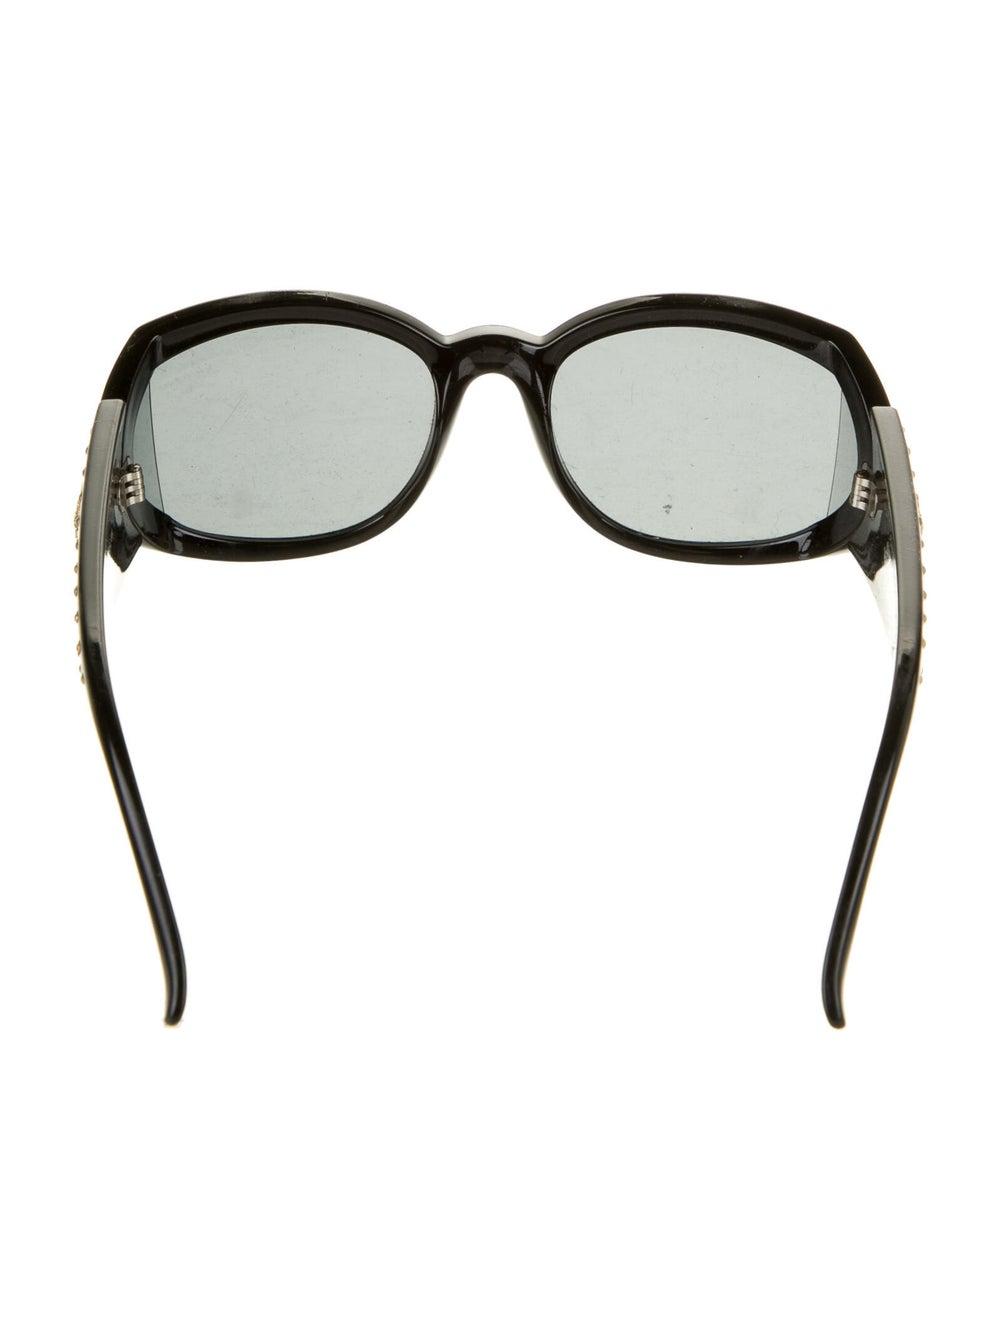 Gianni Versace Oversize Tinted Sunglasses Black - image 3